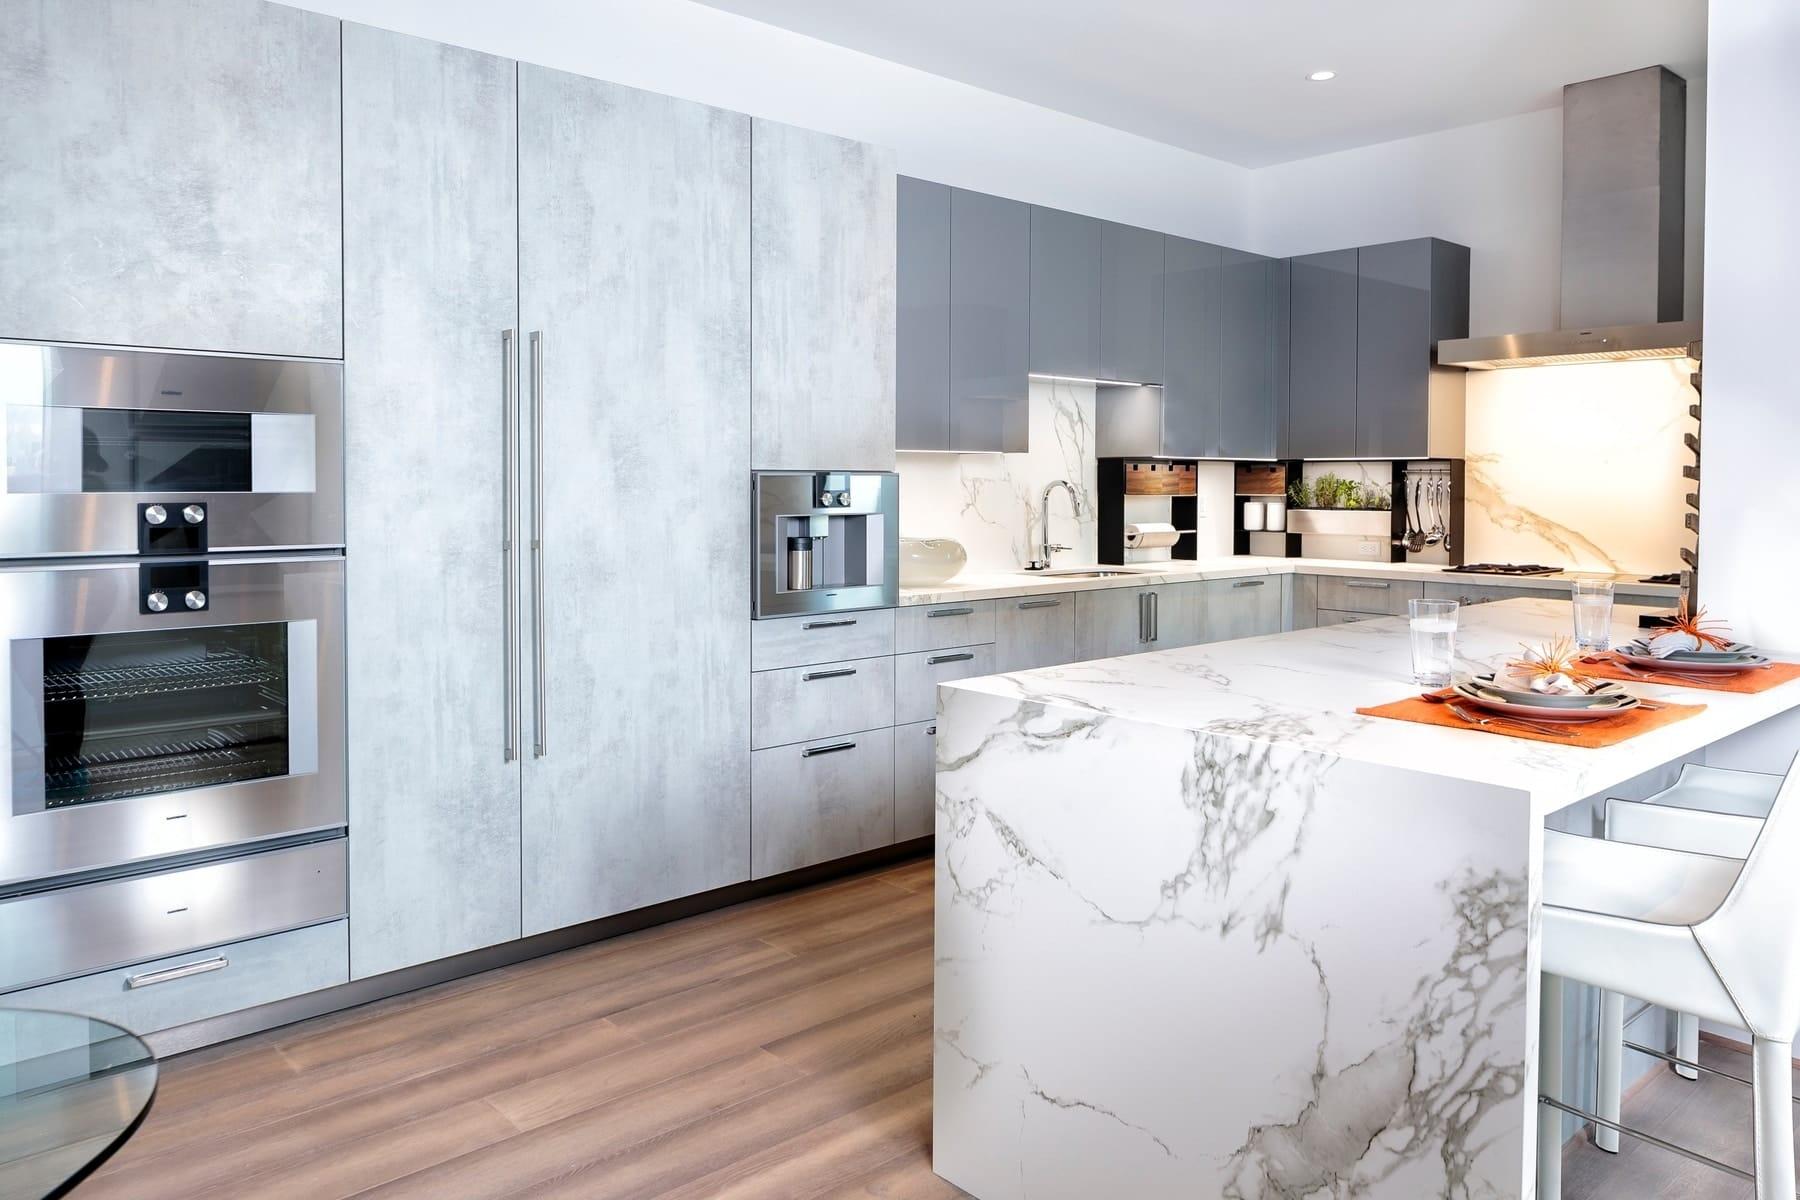 eggersmann german cabinetry in the model unit of arabella luxury condos in houston